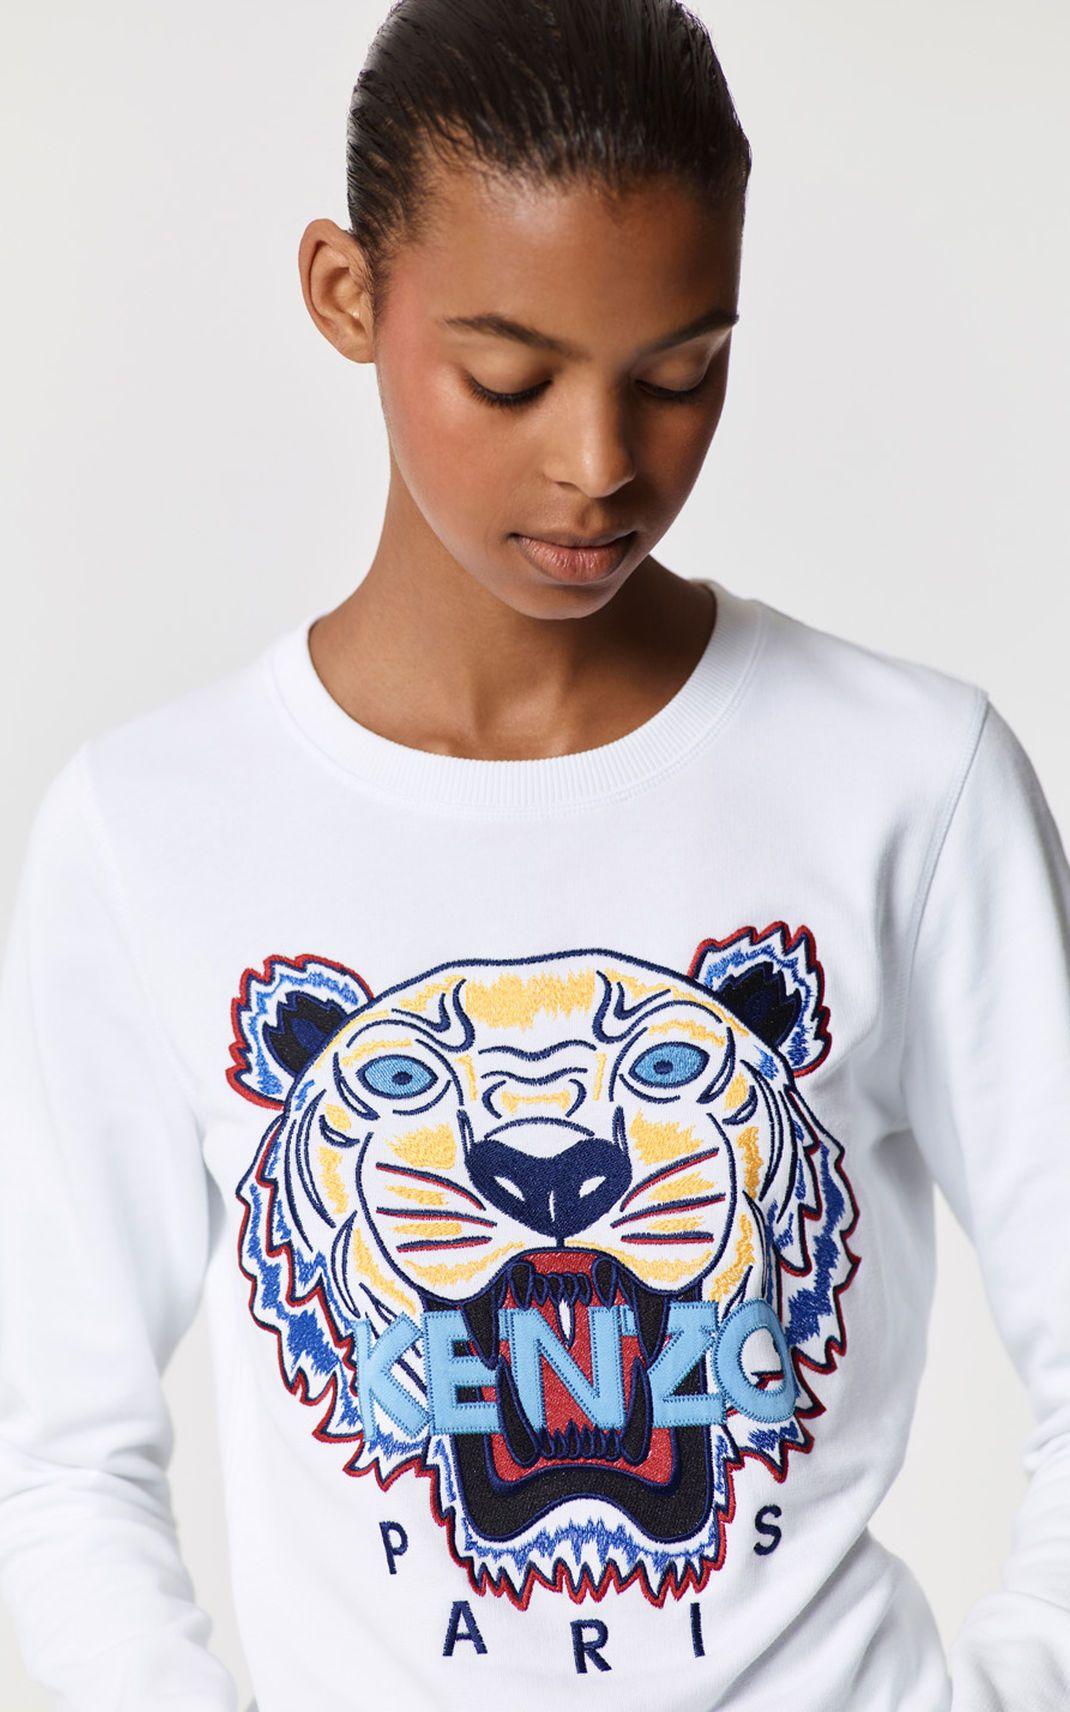 White Tiger Sweatshirt For Women Kenzo Tiger Sweatshirt Women Sweatshirts [ 1712 x 1070 Pixel ]